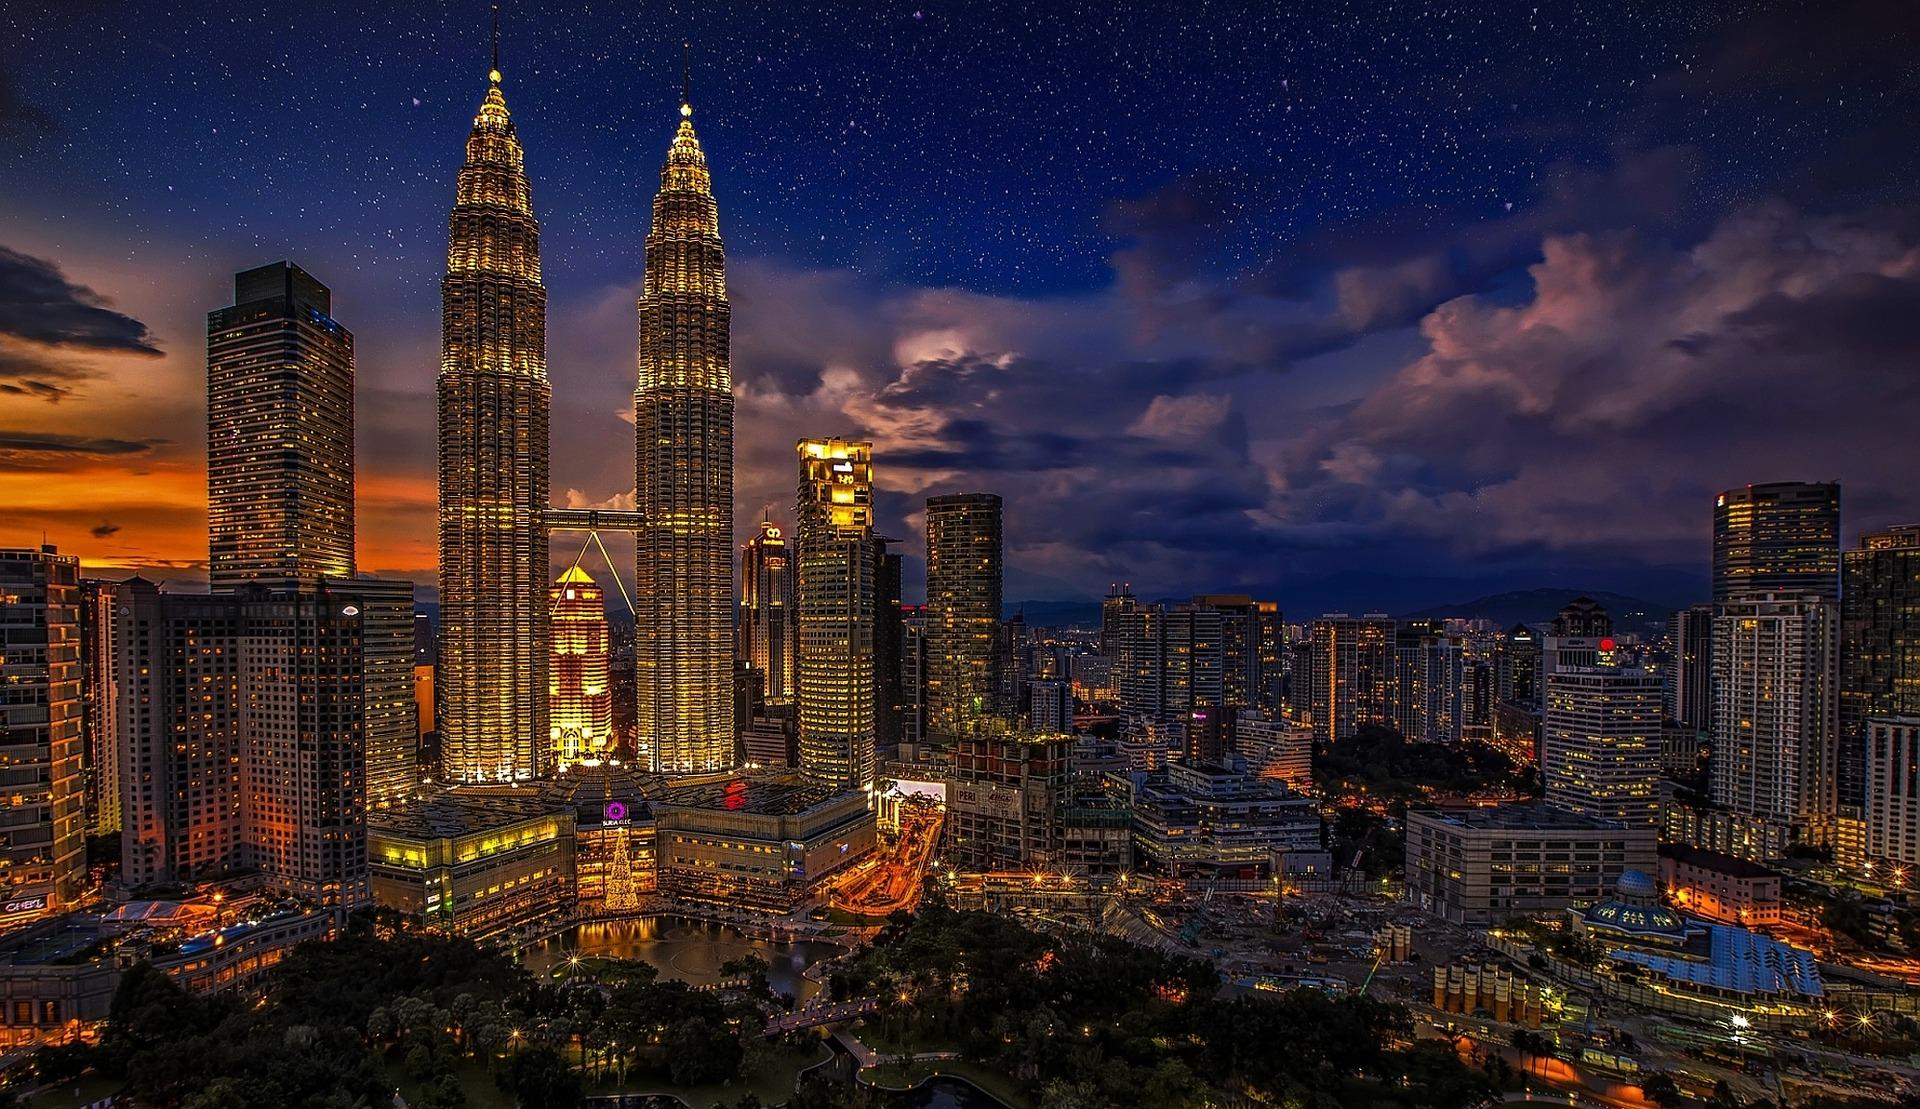 CO-City, un proyecto para construir ciudades inteligentes